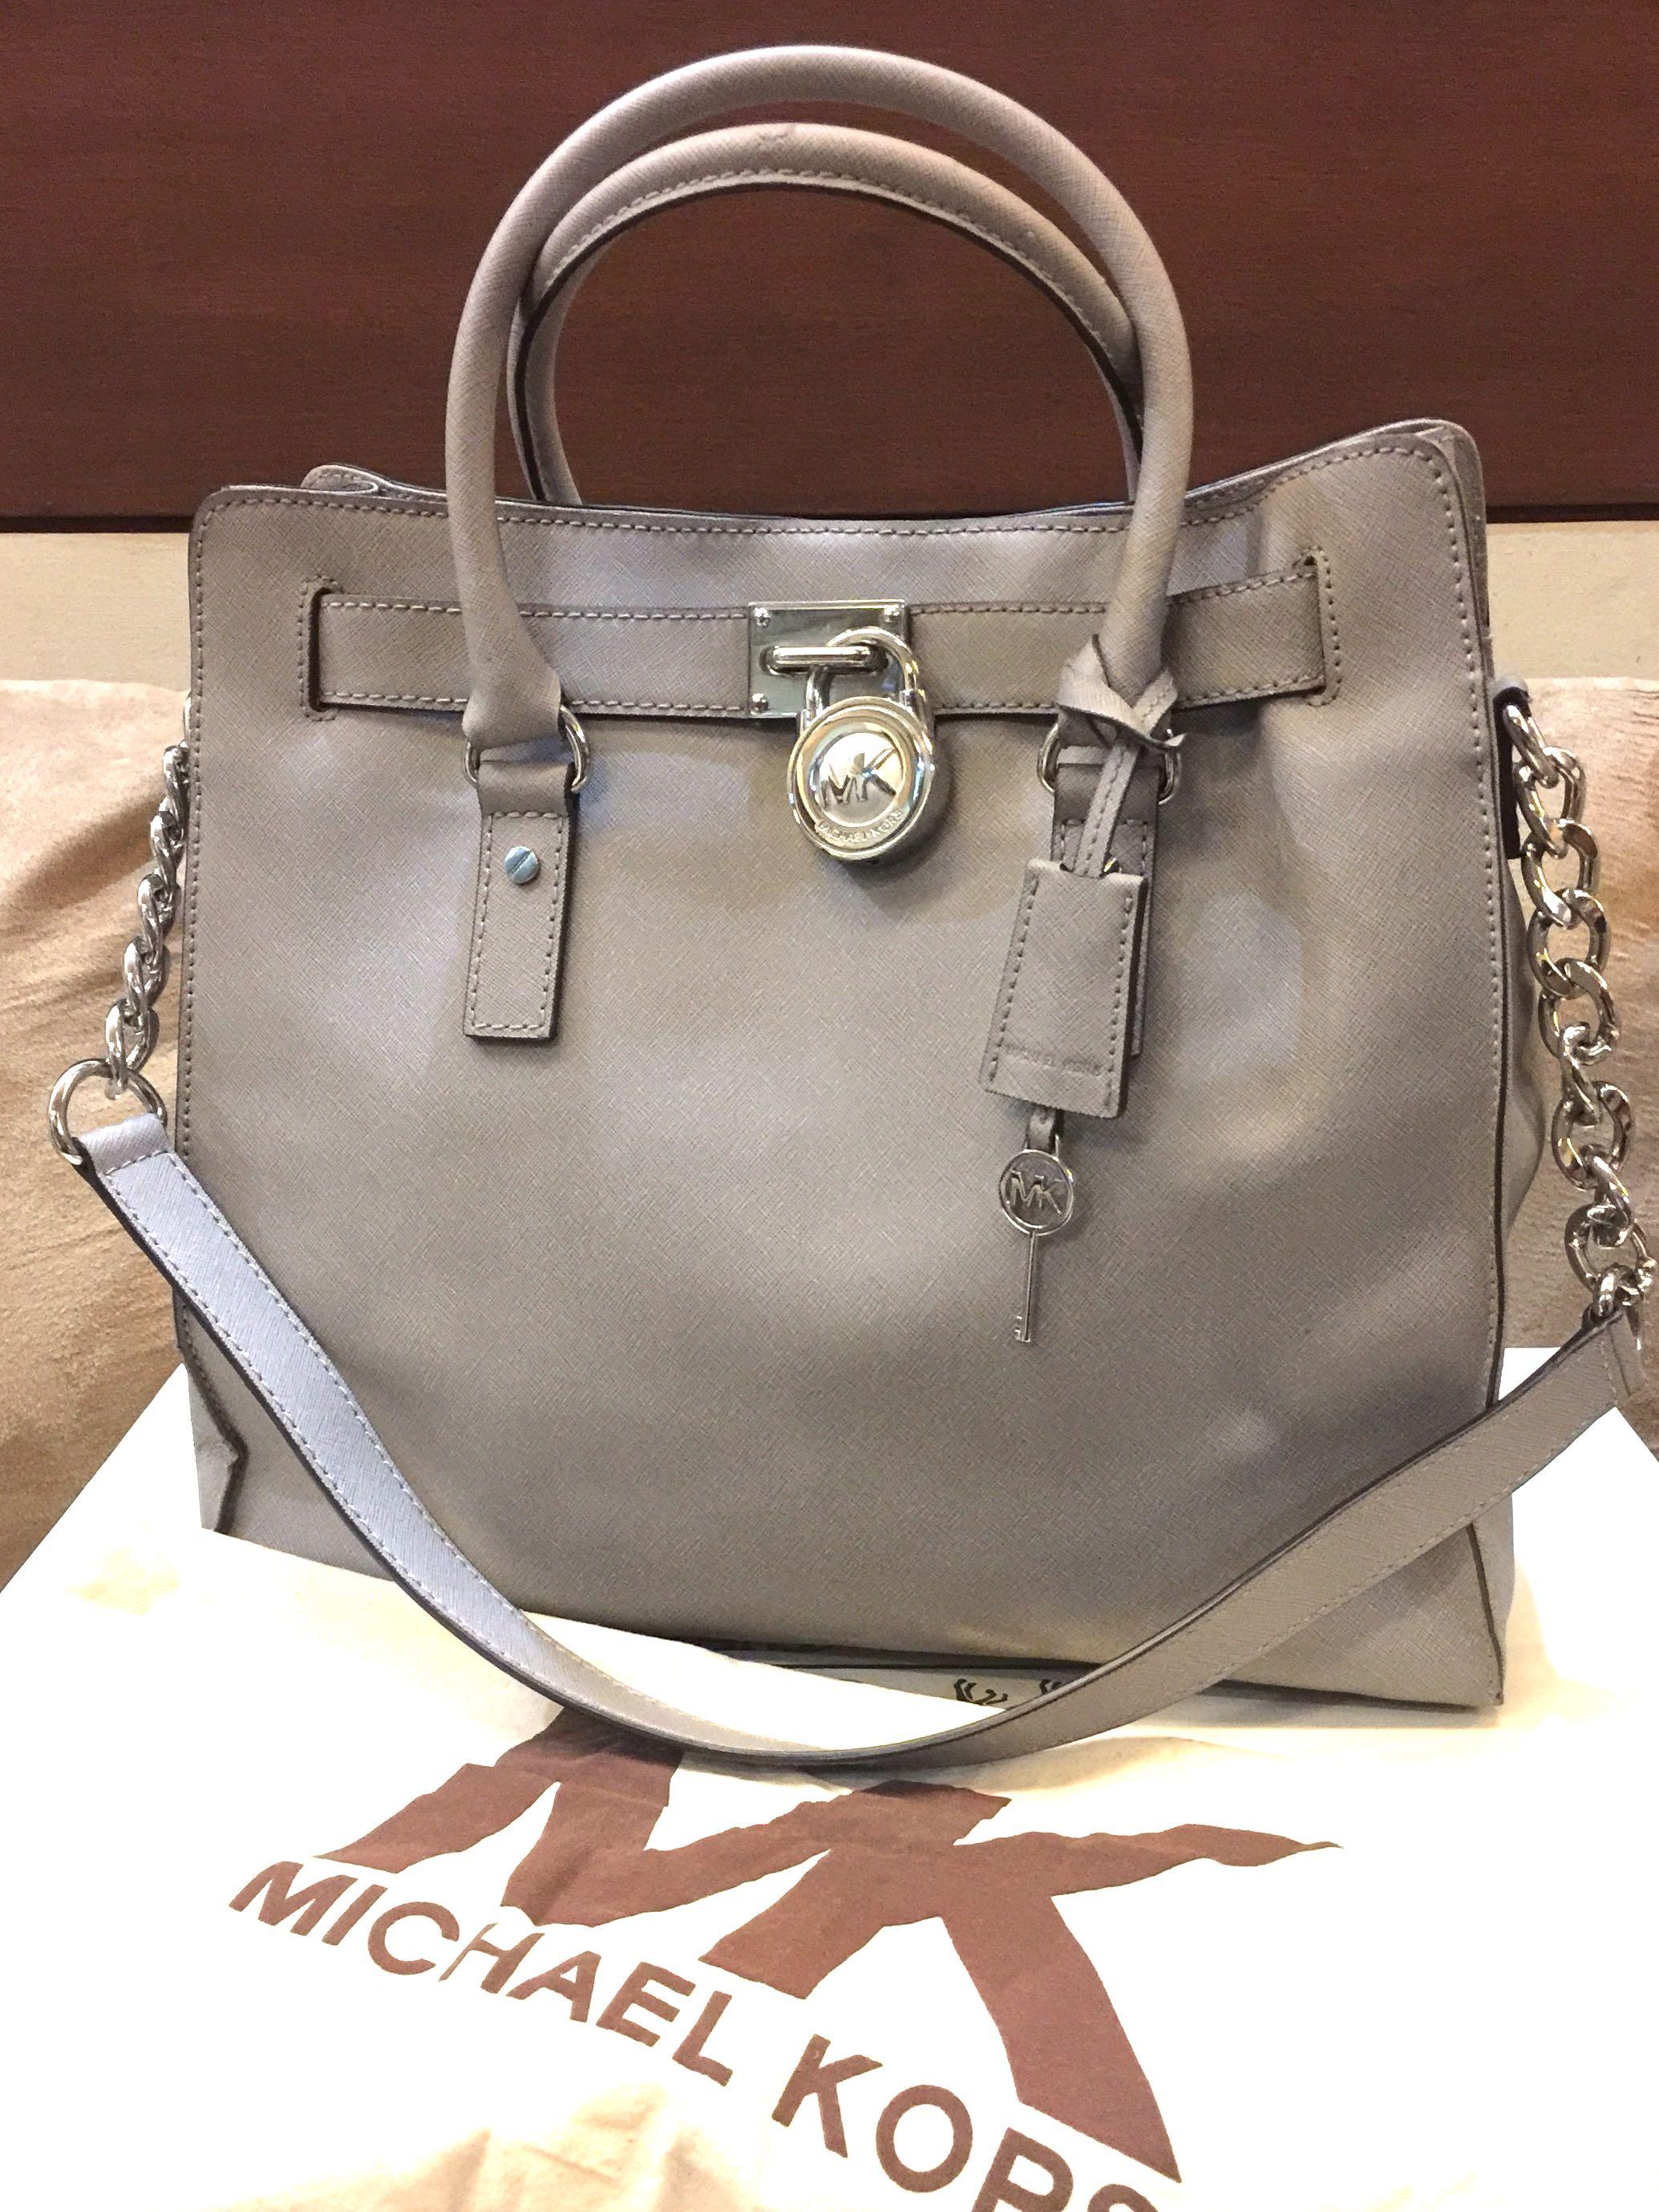 445fa985622eaf PRE-LOVED: MICHAEL KORS Hamilton Large Tote, Women's Fashion, Bags ...